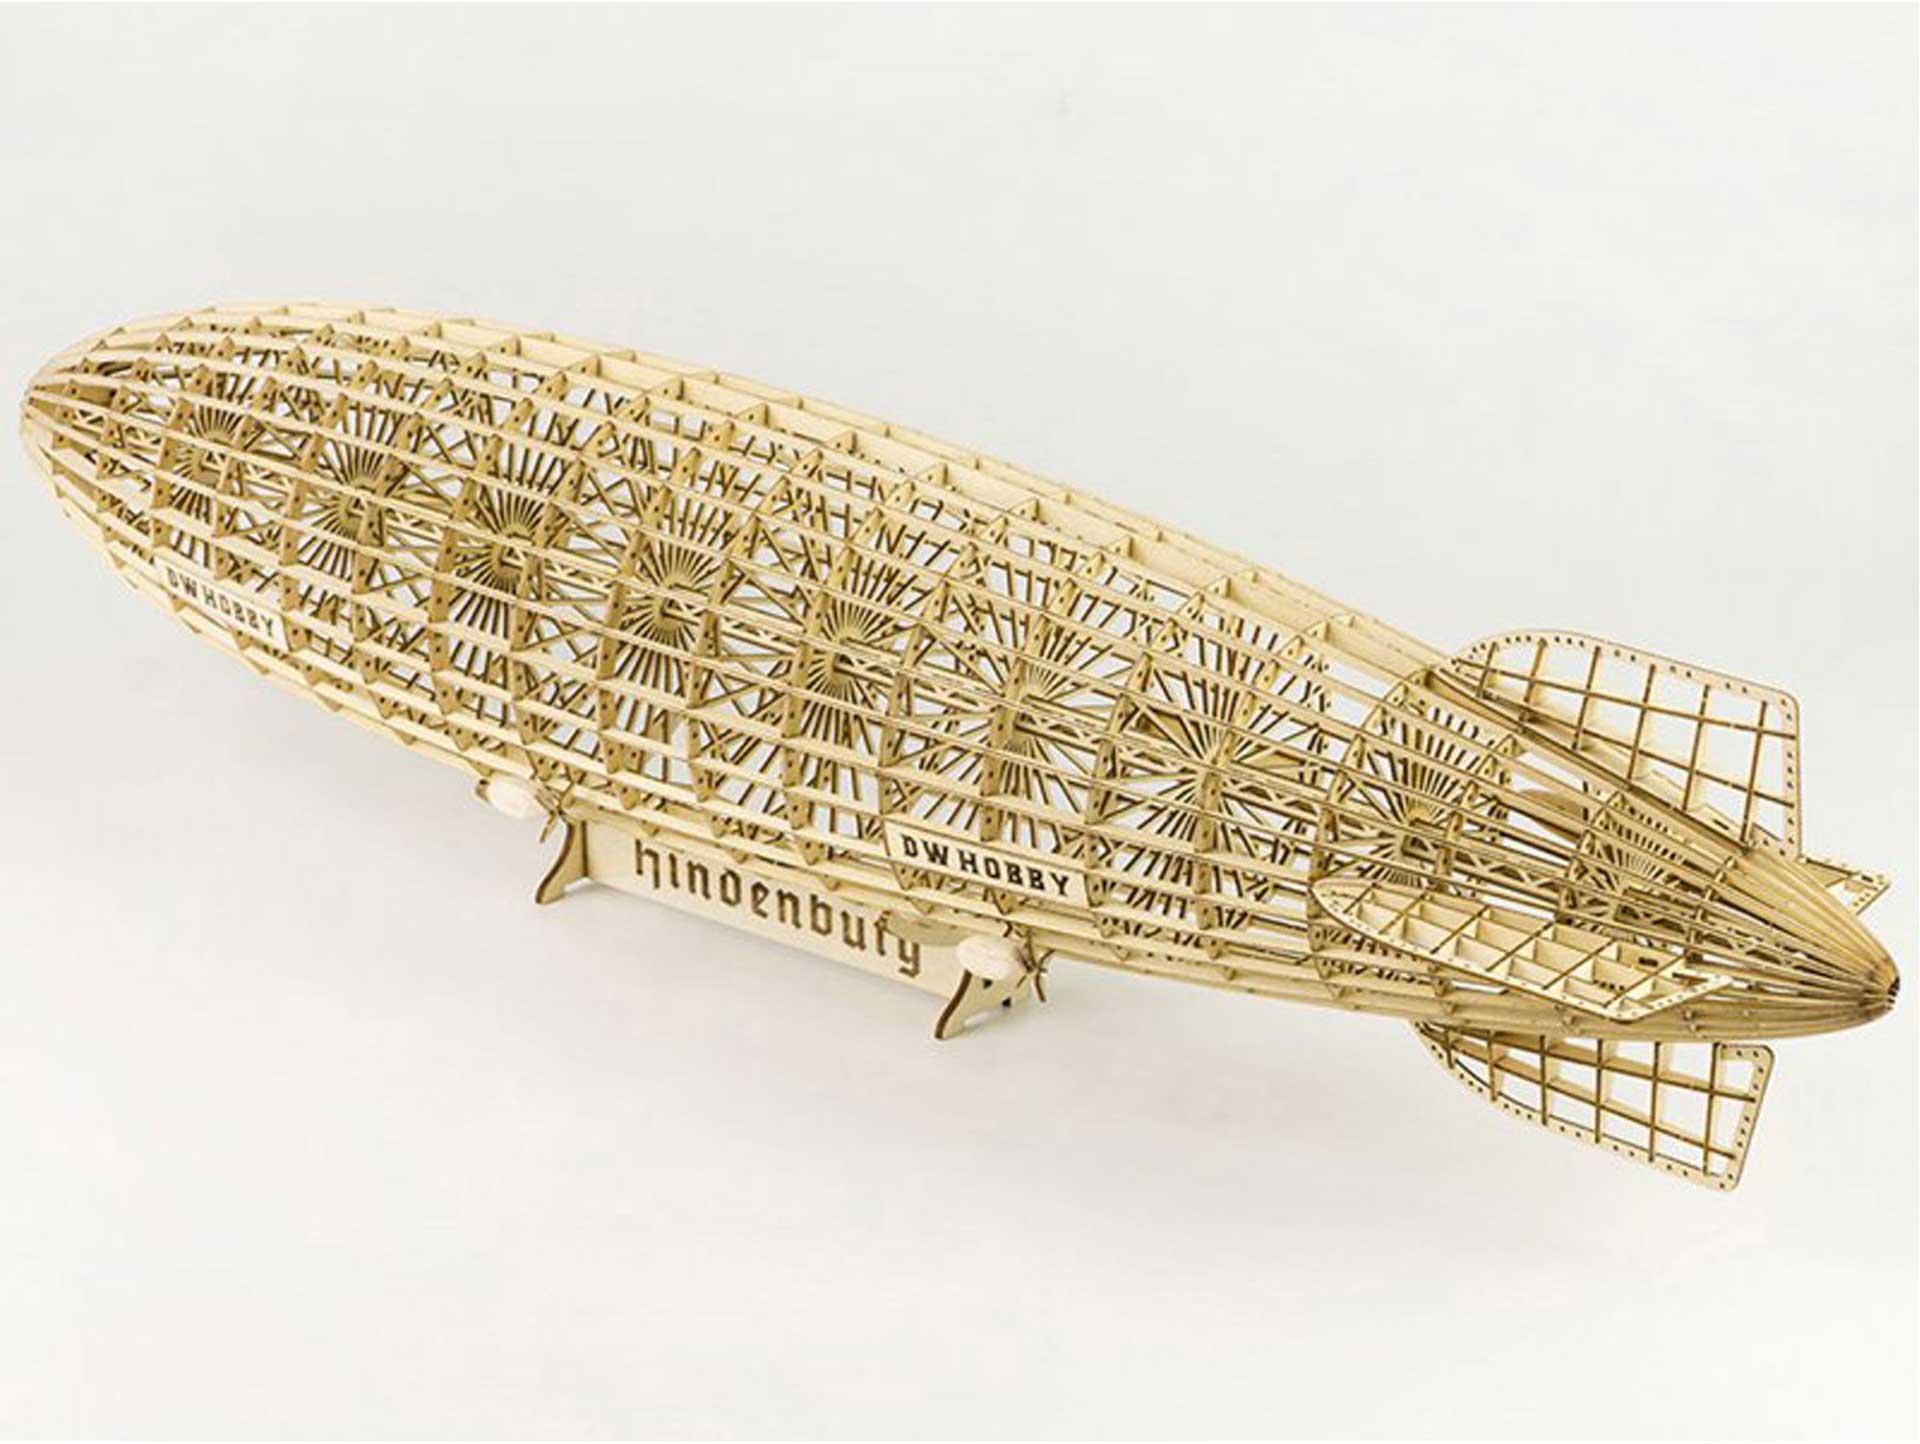 Pichler Hindenburg LZ-129 / 600mm 3D-Puzzle Holzbausatz